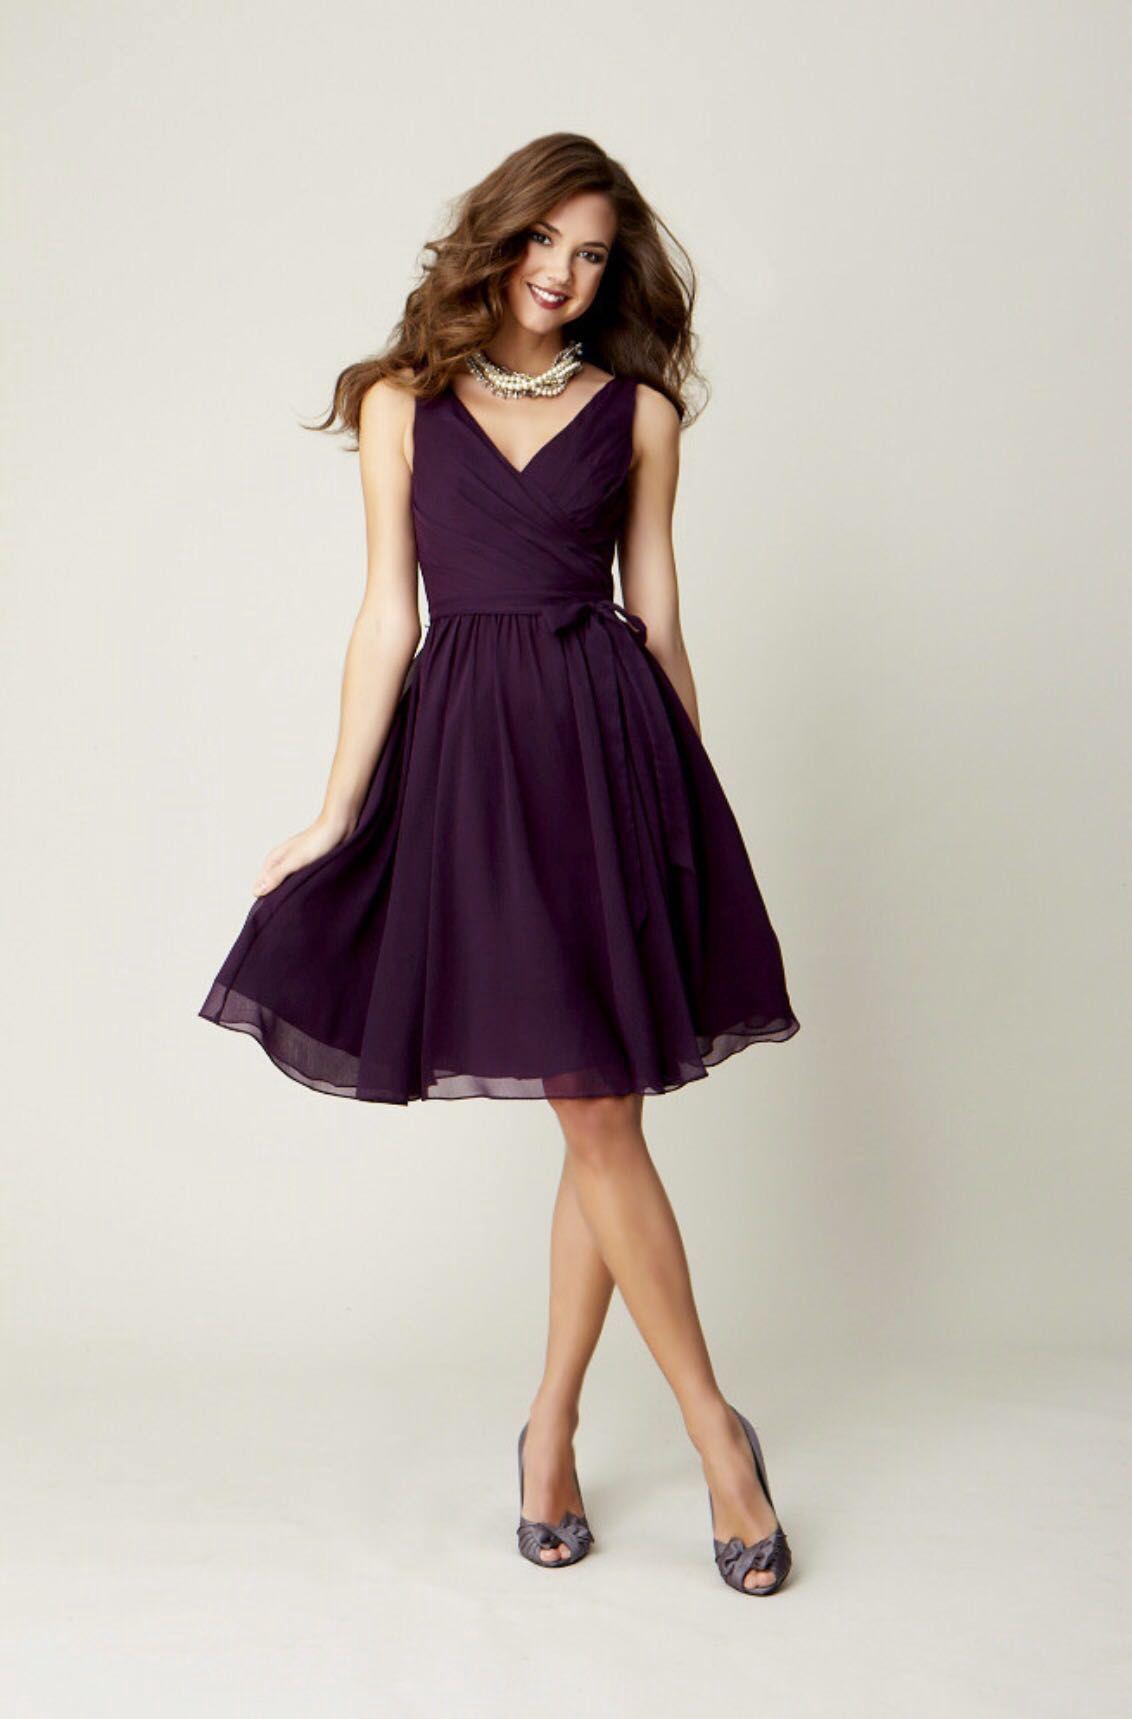 Emily Swan Twilight Jasper Hale Epilogue Bridesmaid Dresses Short Purple Dark Purple Bridesmaid Dresses Knee Length Bridesmaid Dresses [ 1719 x 1132 Pixel ]